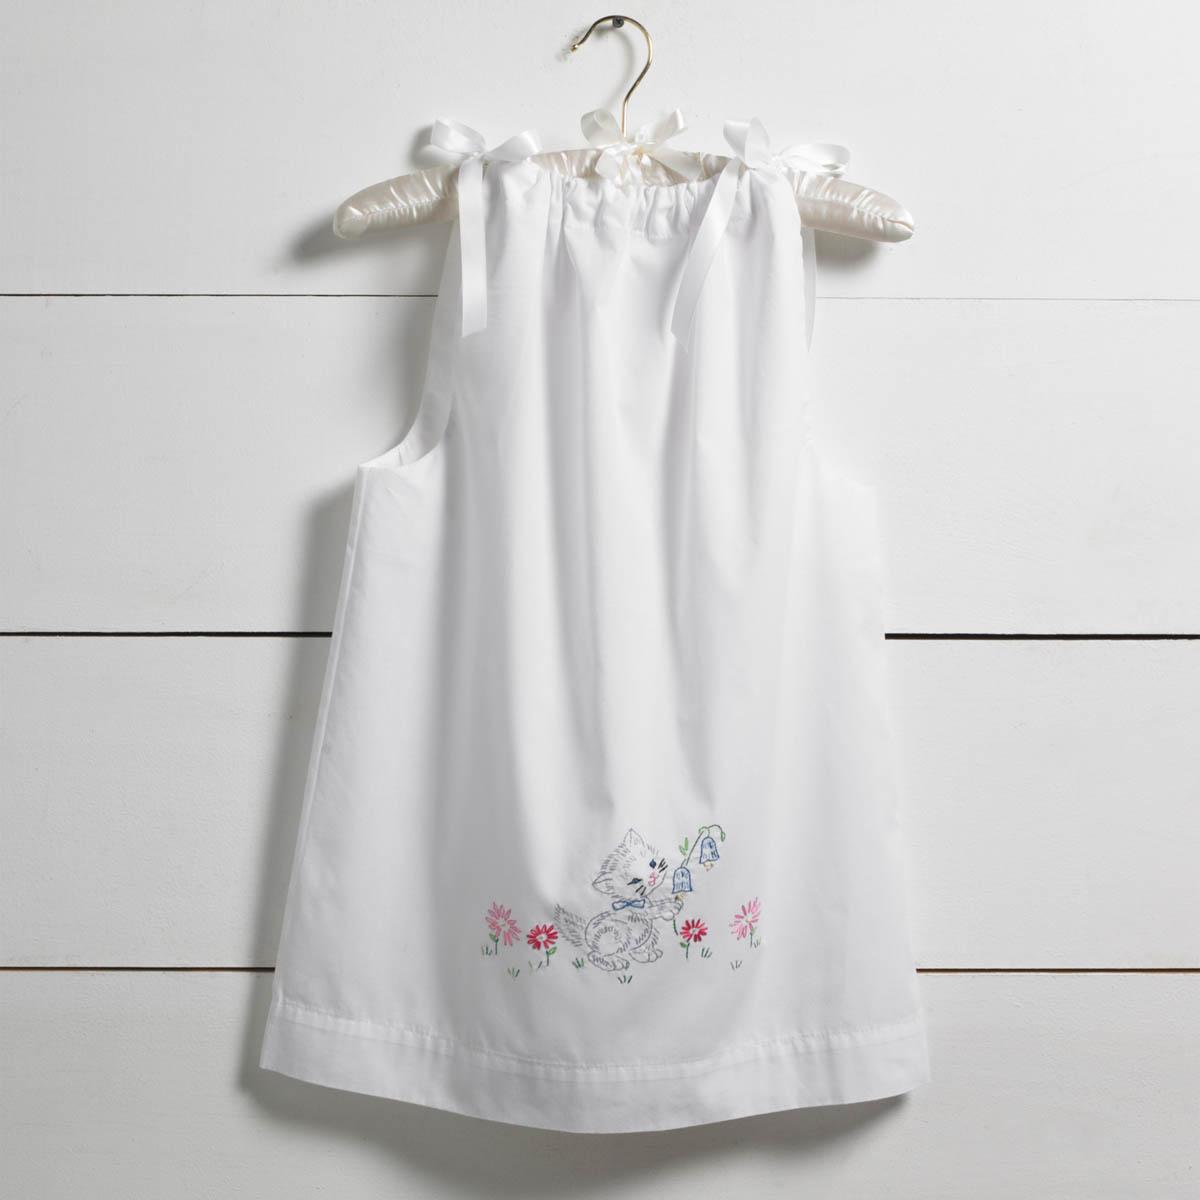 Bucilla ® Stamped Cross Stitch & Embroidery - Pillowcase Dress - Kitten - 47717